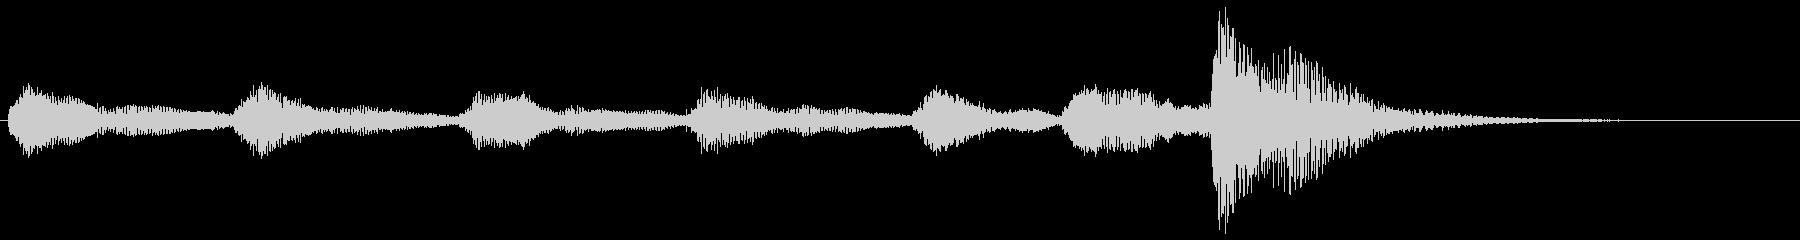 T.V.コンテンポラリーインスト卑...の未再生の波形